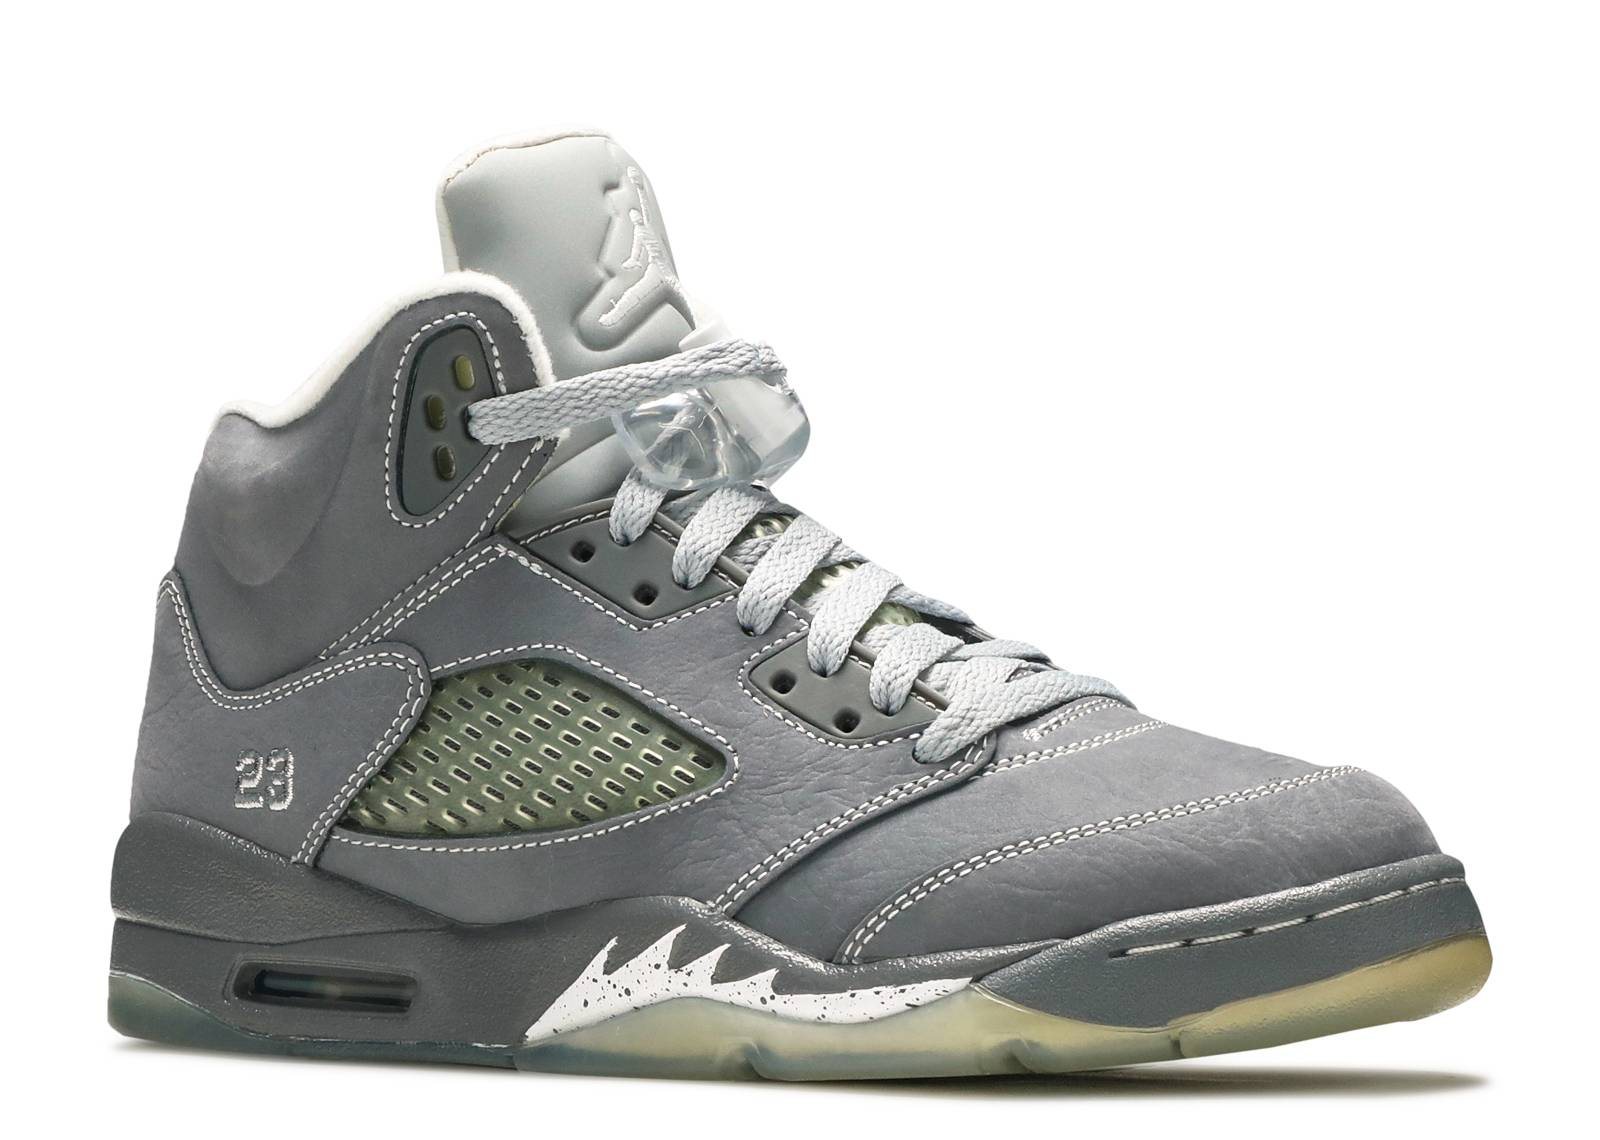 air jordan 5 retro (gs) lt graphite/white-wolf grey | 1600 x 1140 jpeg 239kB